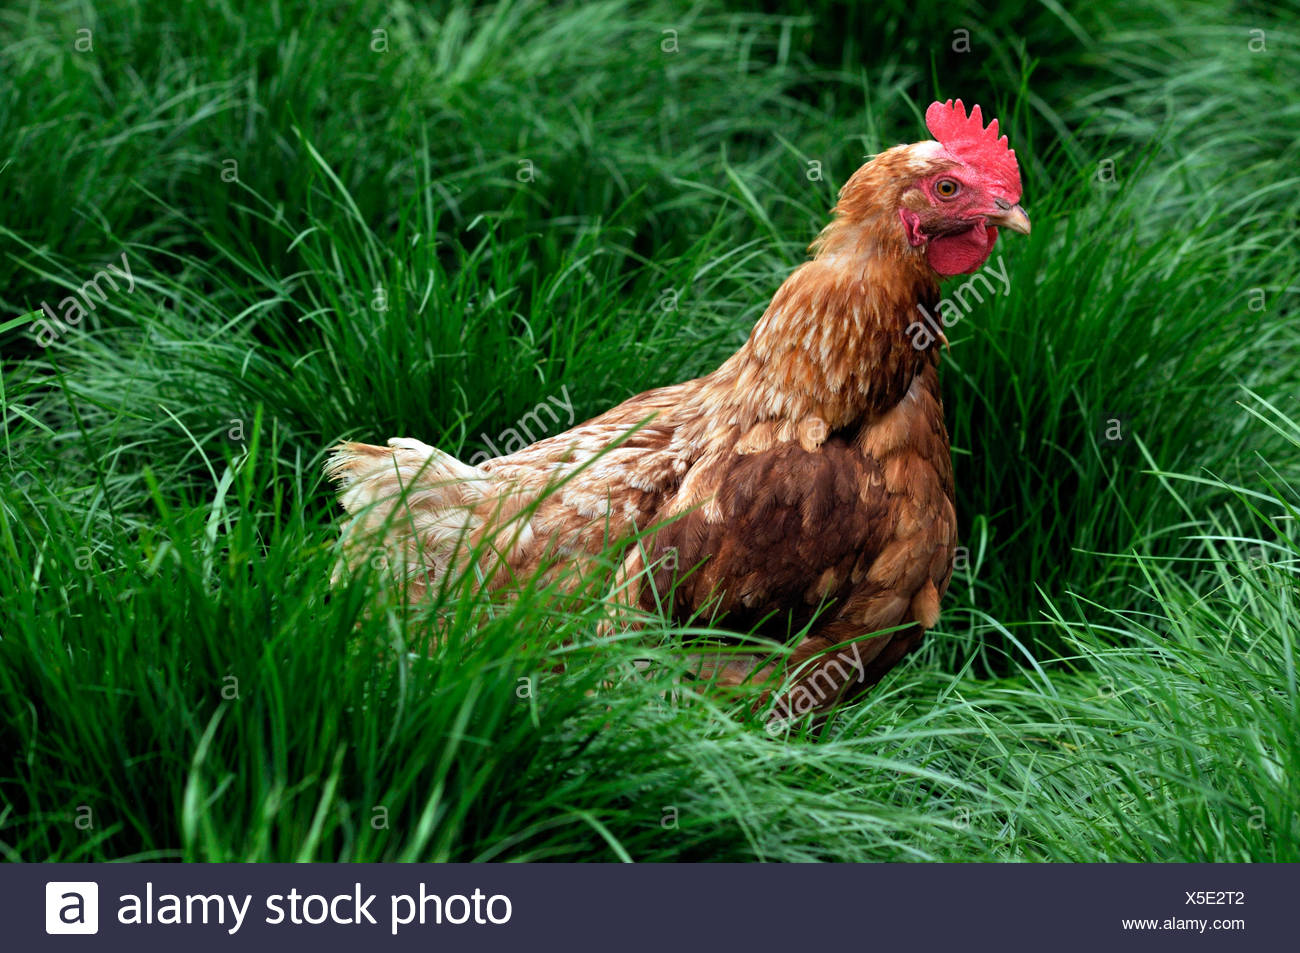 Brown Domesticated Chicken (Gallus gallus domesticus) in grass - Stock Image